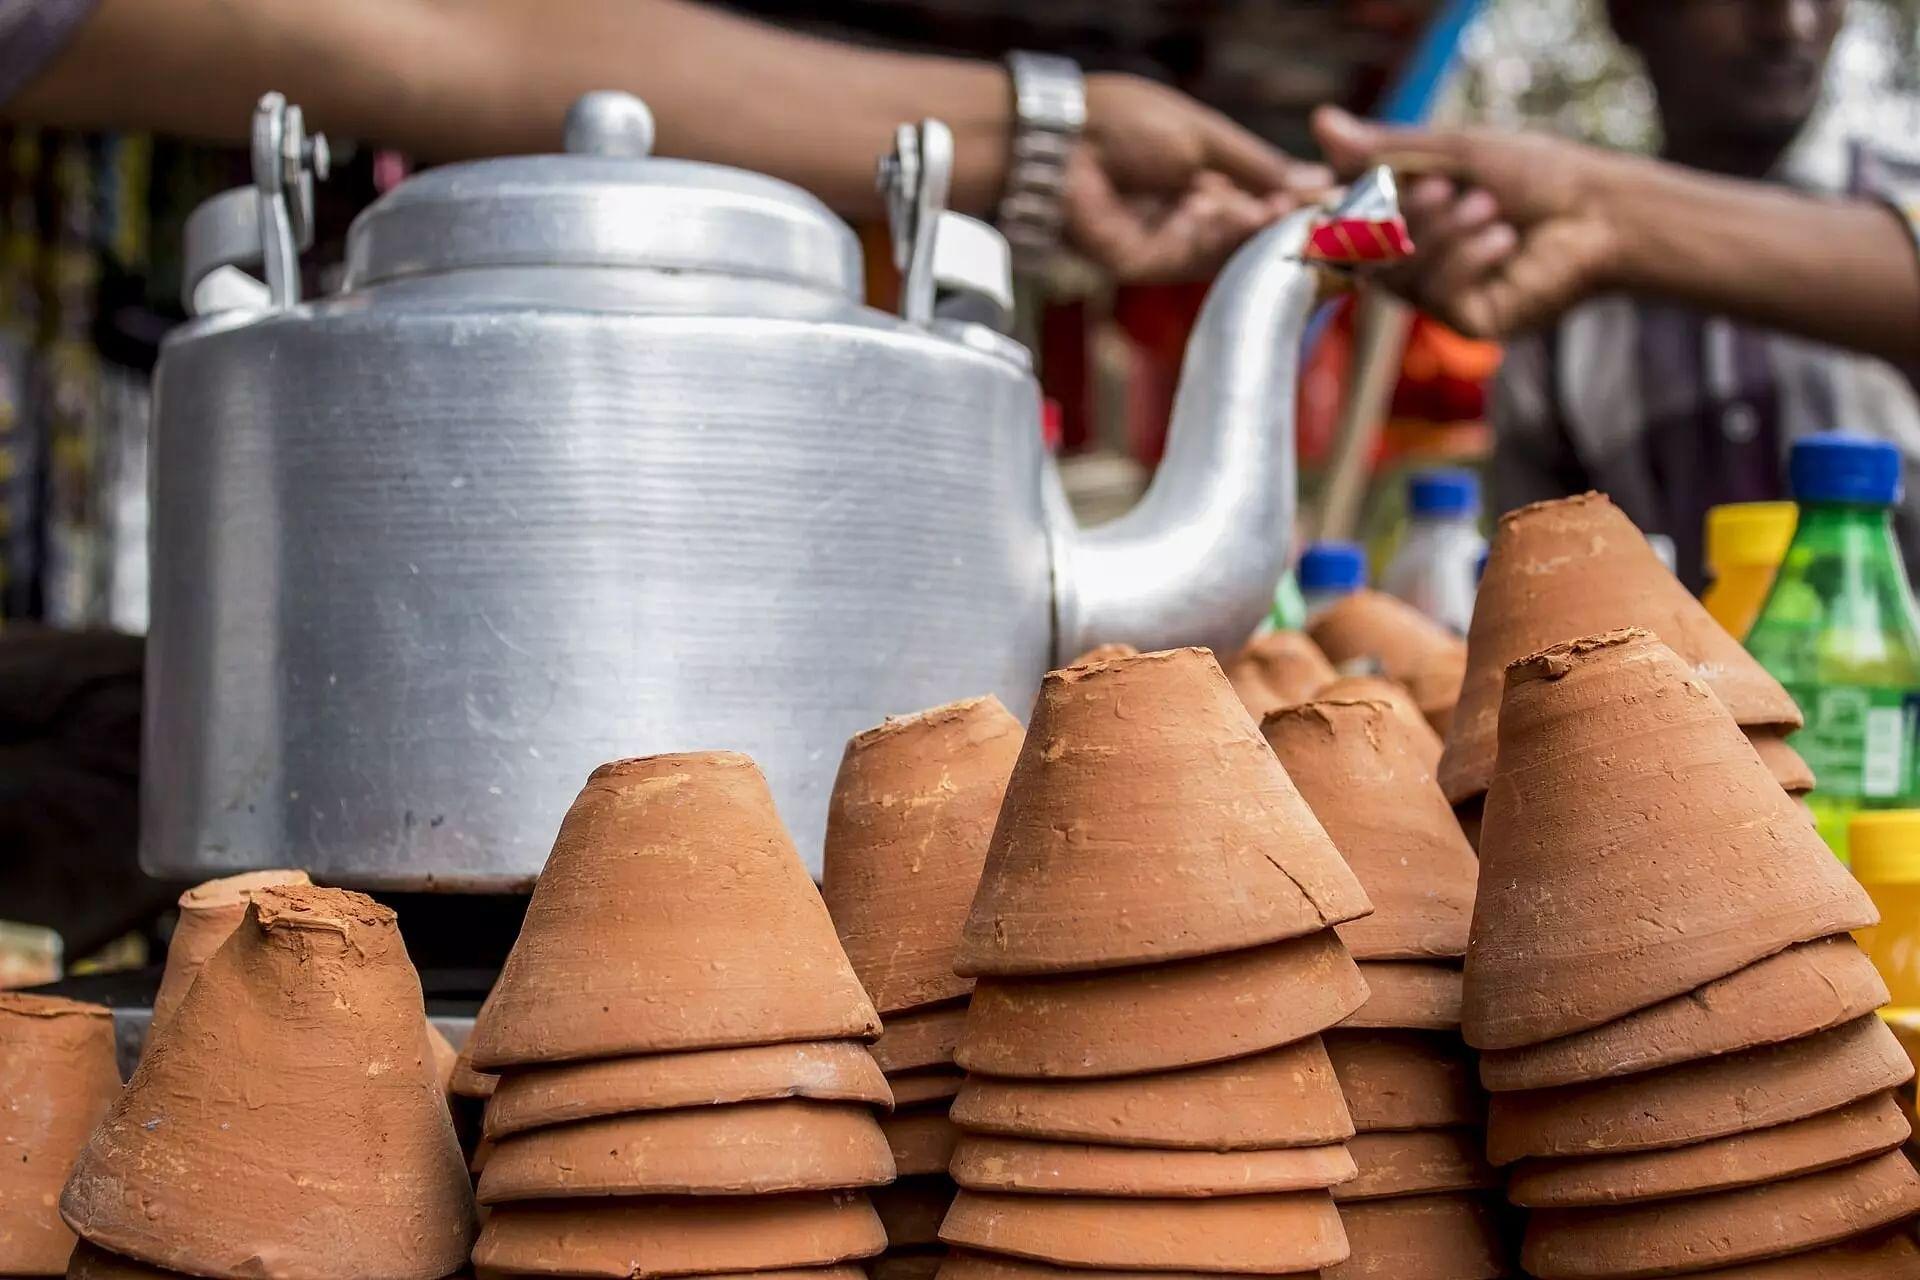 14 year old Mumbai boy turns tea seller after mother loses job during lockdown